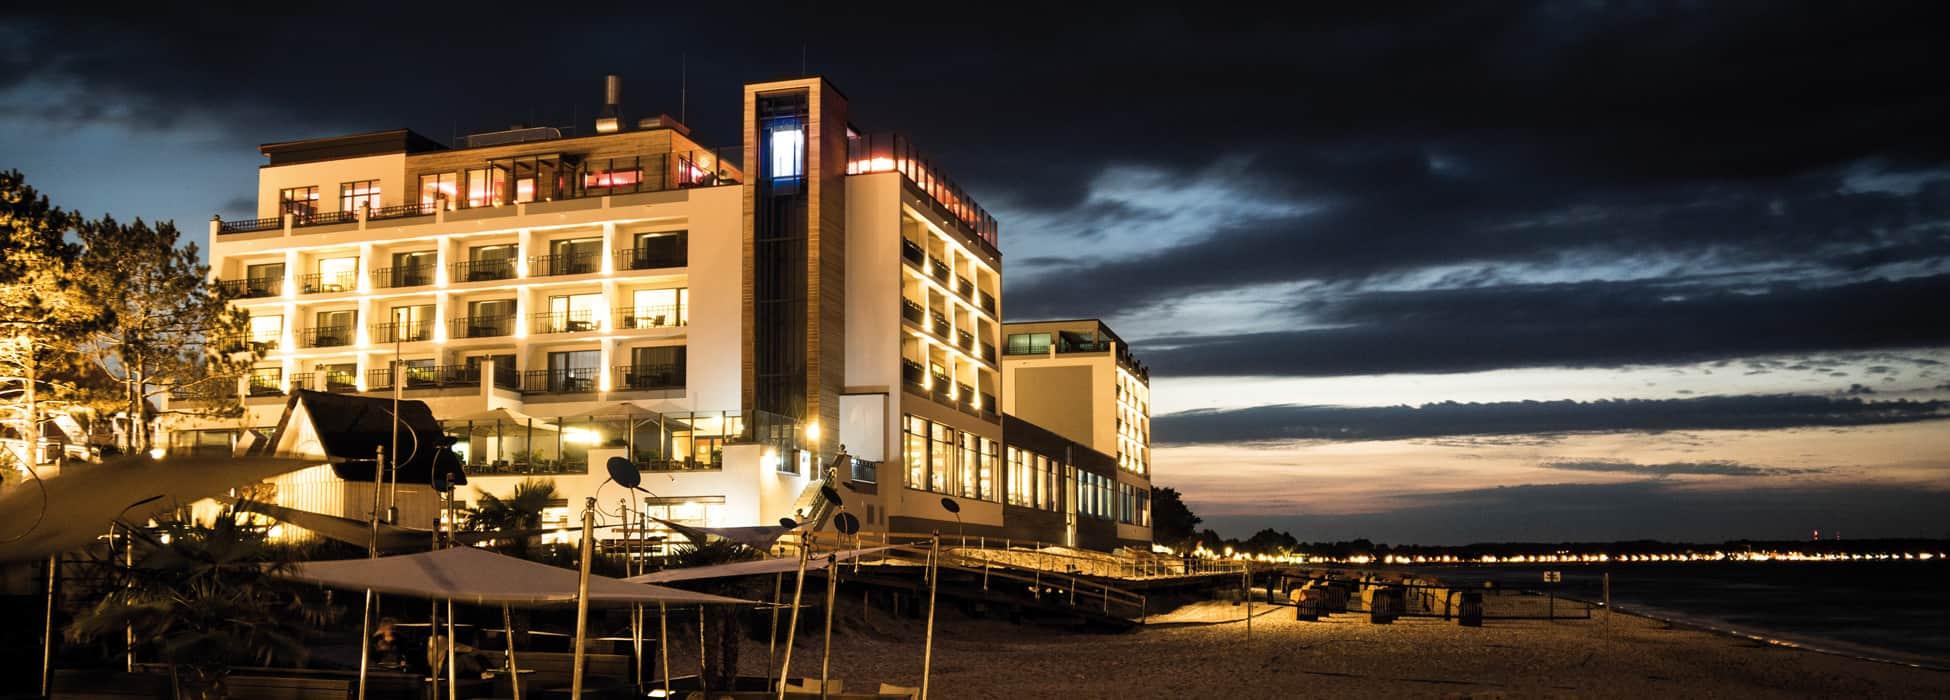 BAYSIDE Hotel Abendstimmung am Strand